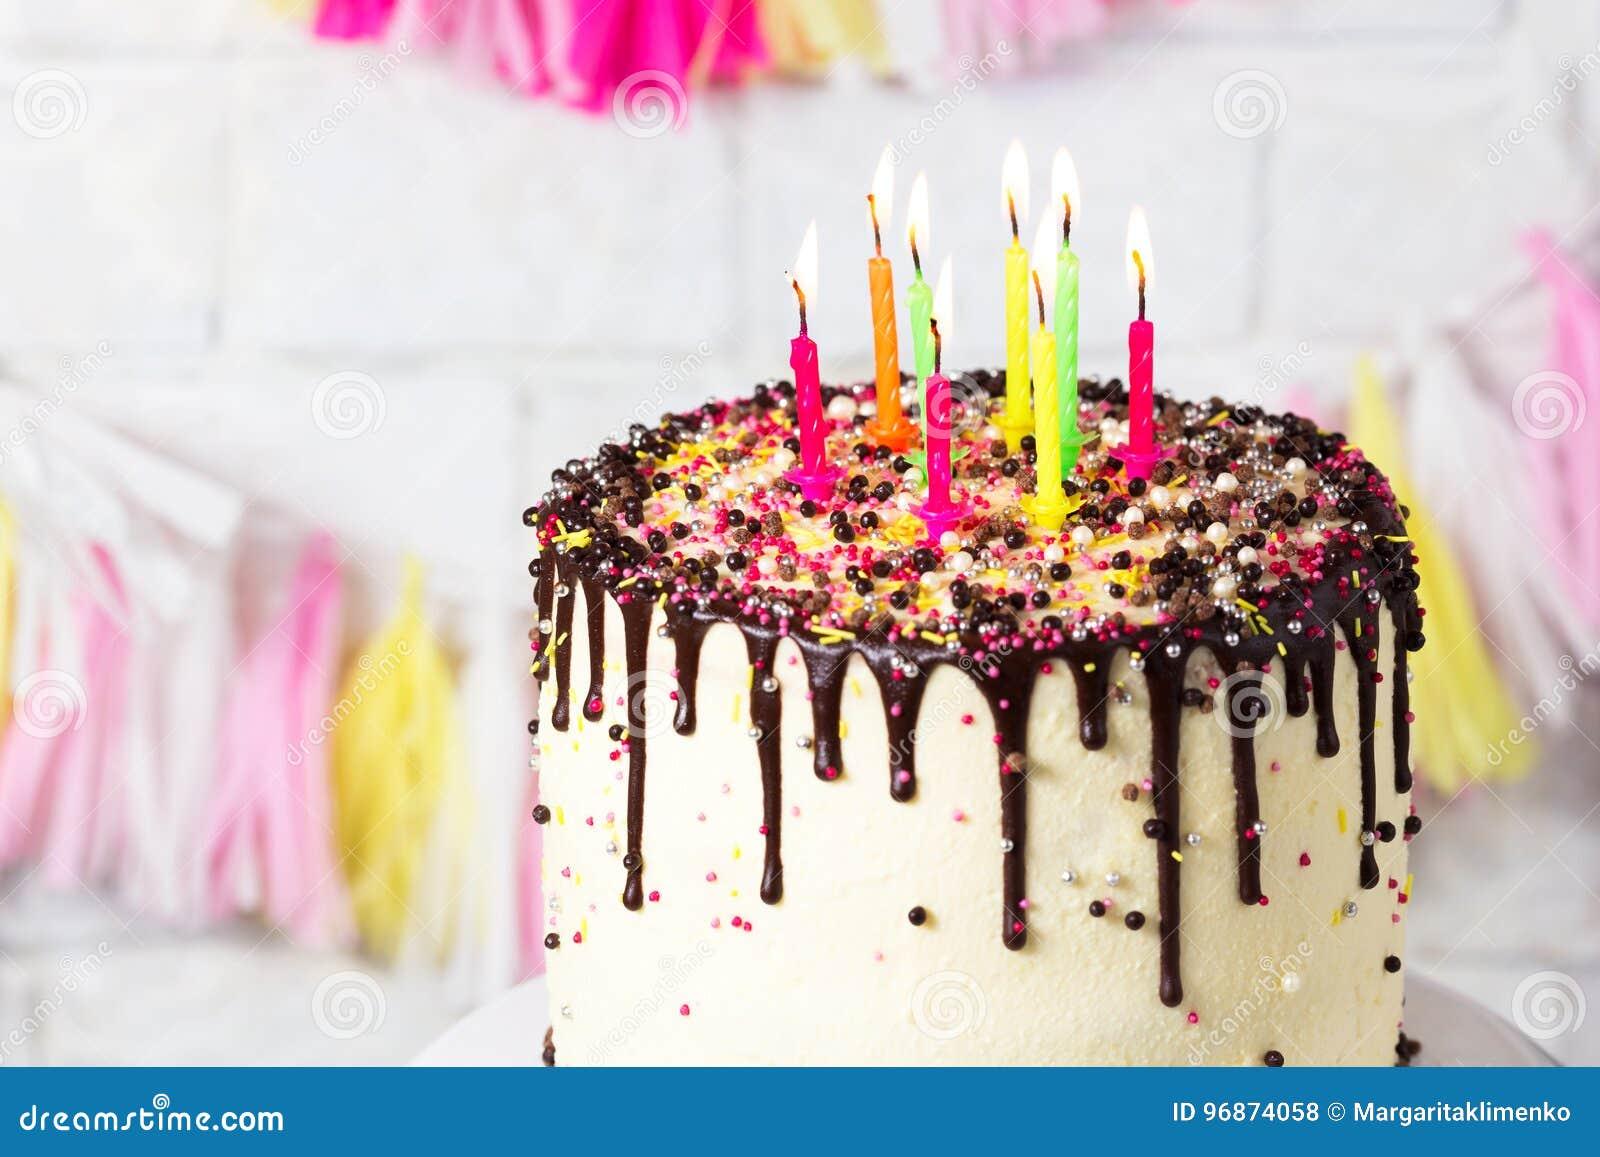 Birthday Cake With Candles Stock Photography Cartoondealer Com